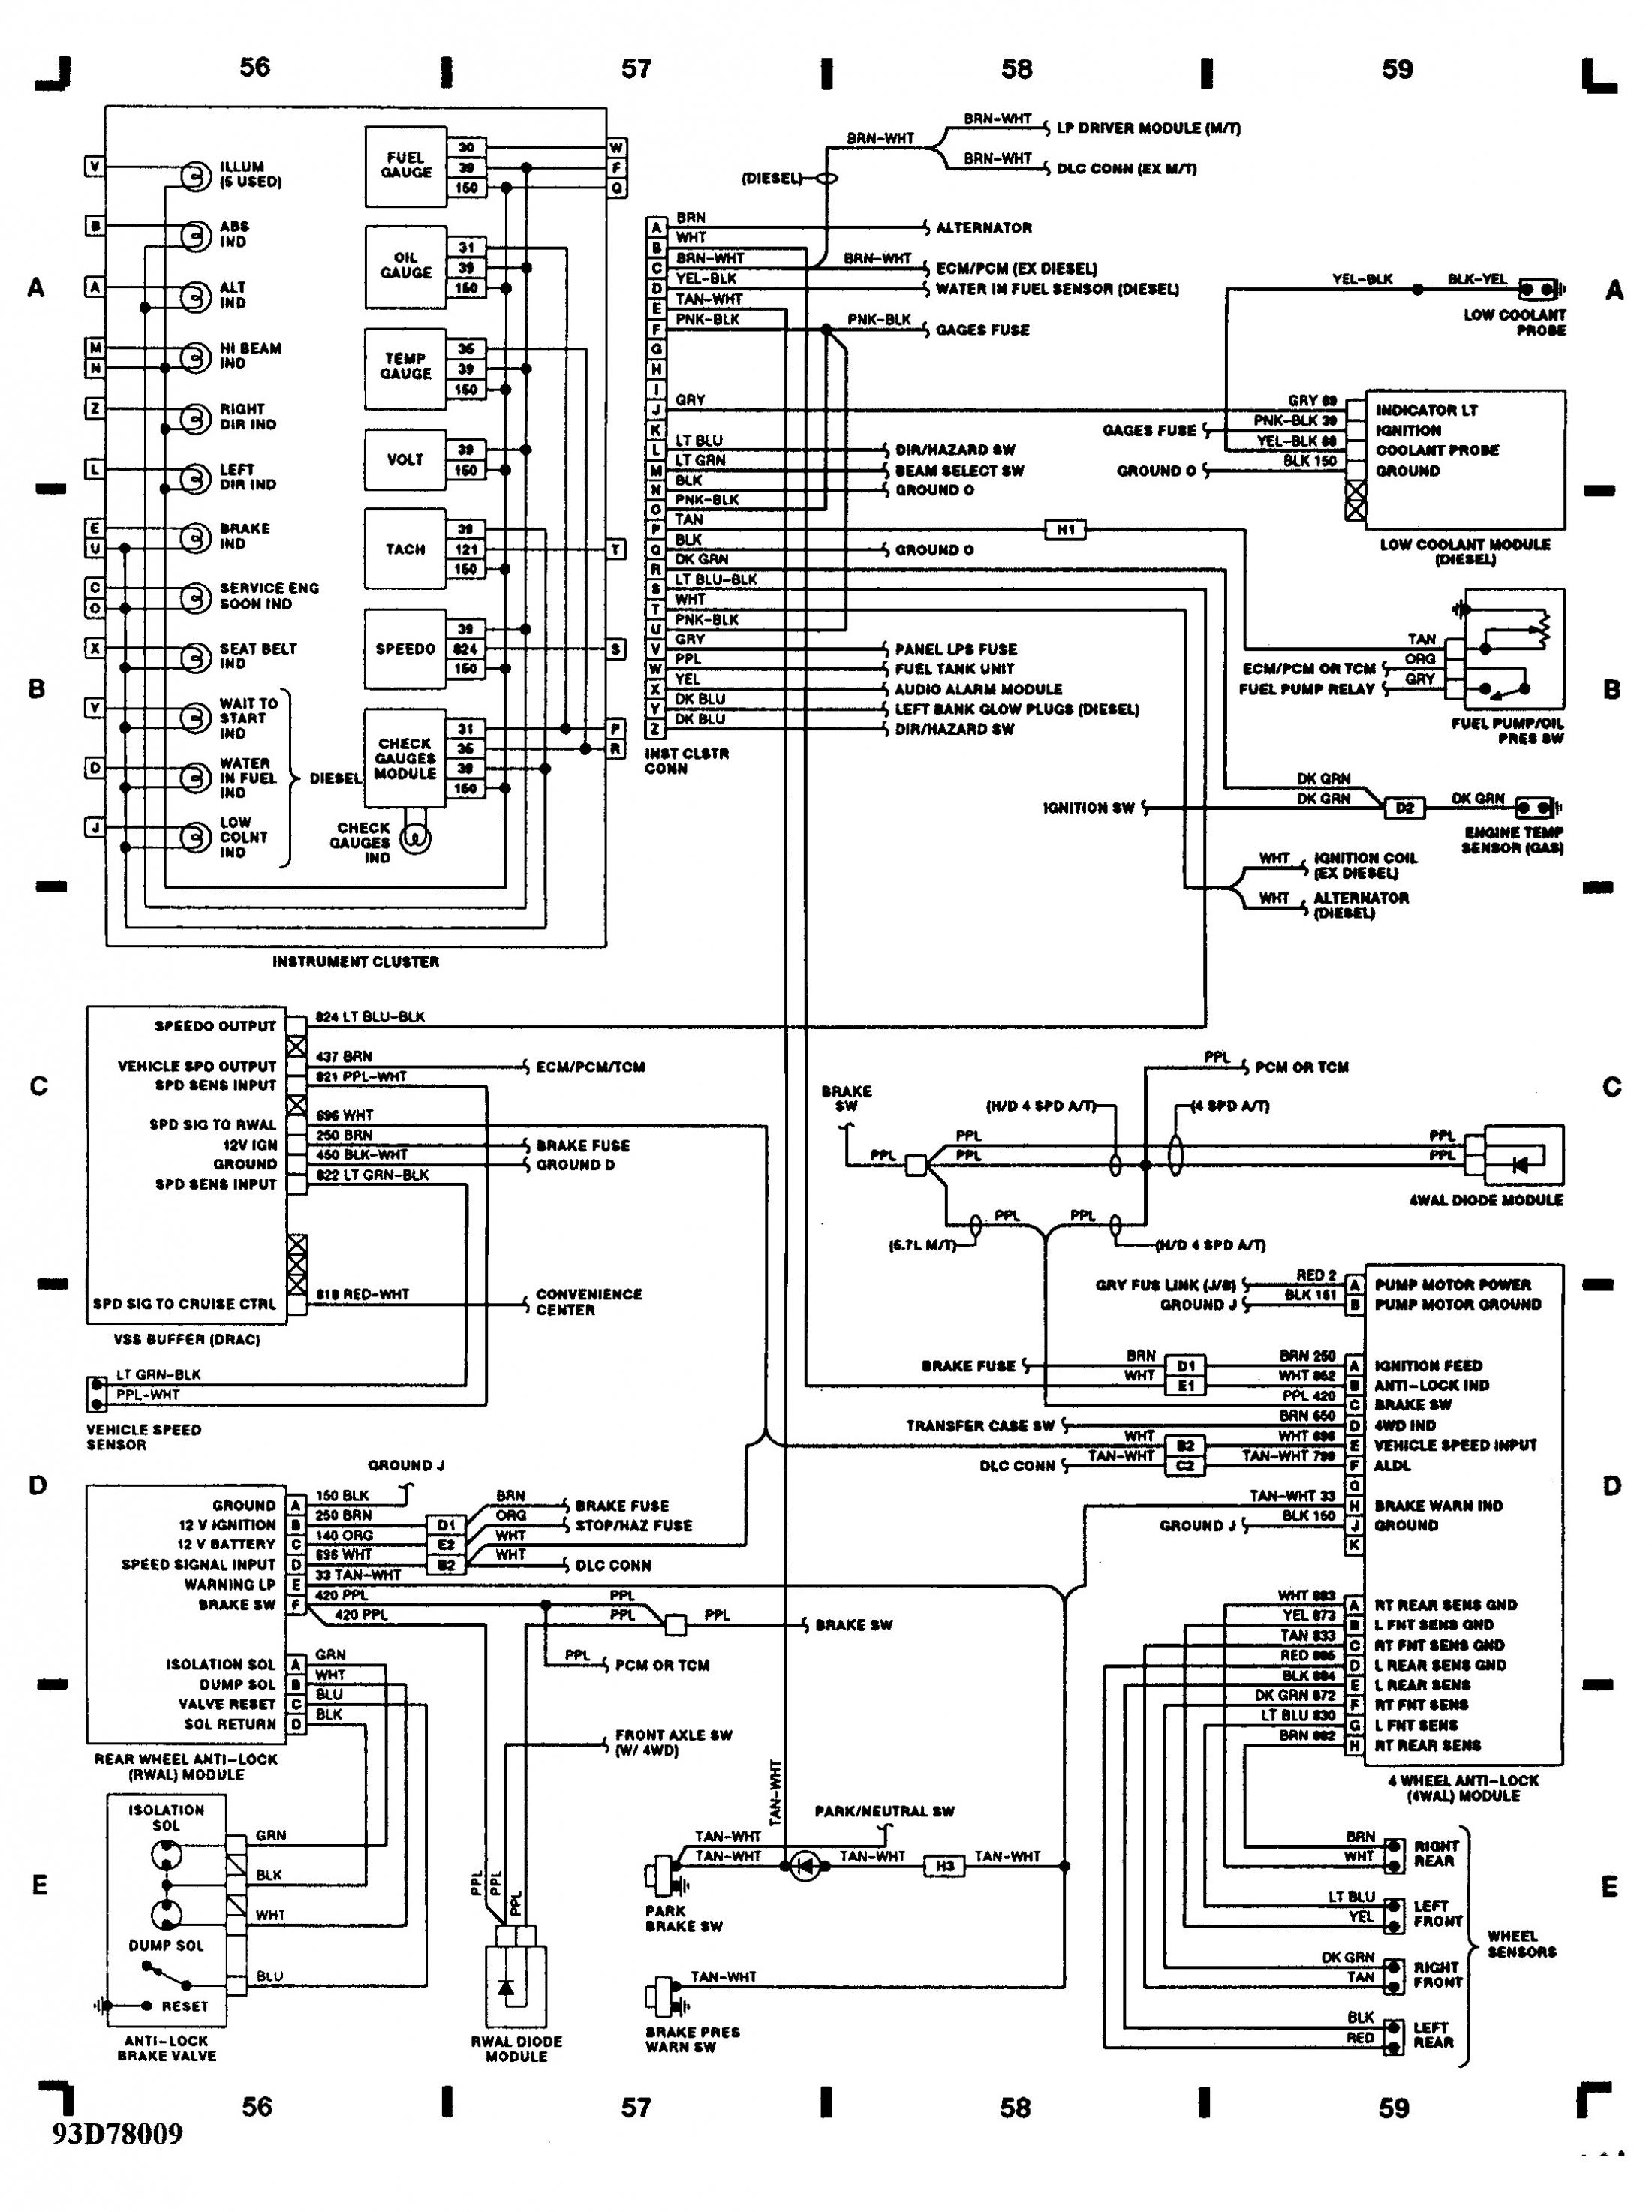 Tpi Gauges Wiring Harness Diagram | Wiring Library - 5.7 Vortec Wiring Harness Diagram